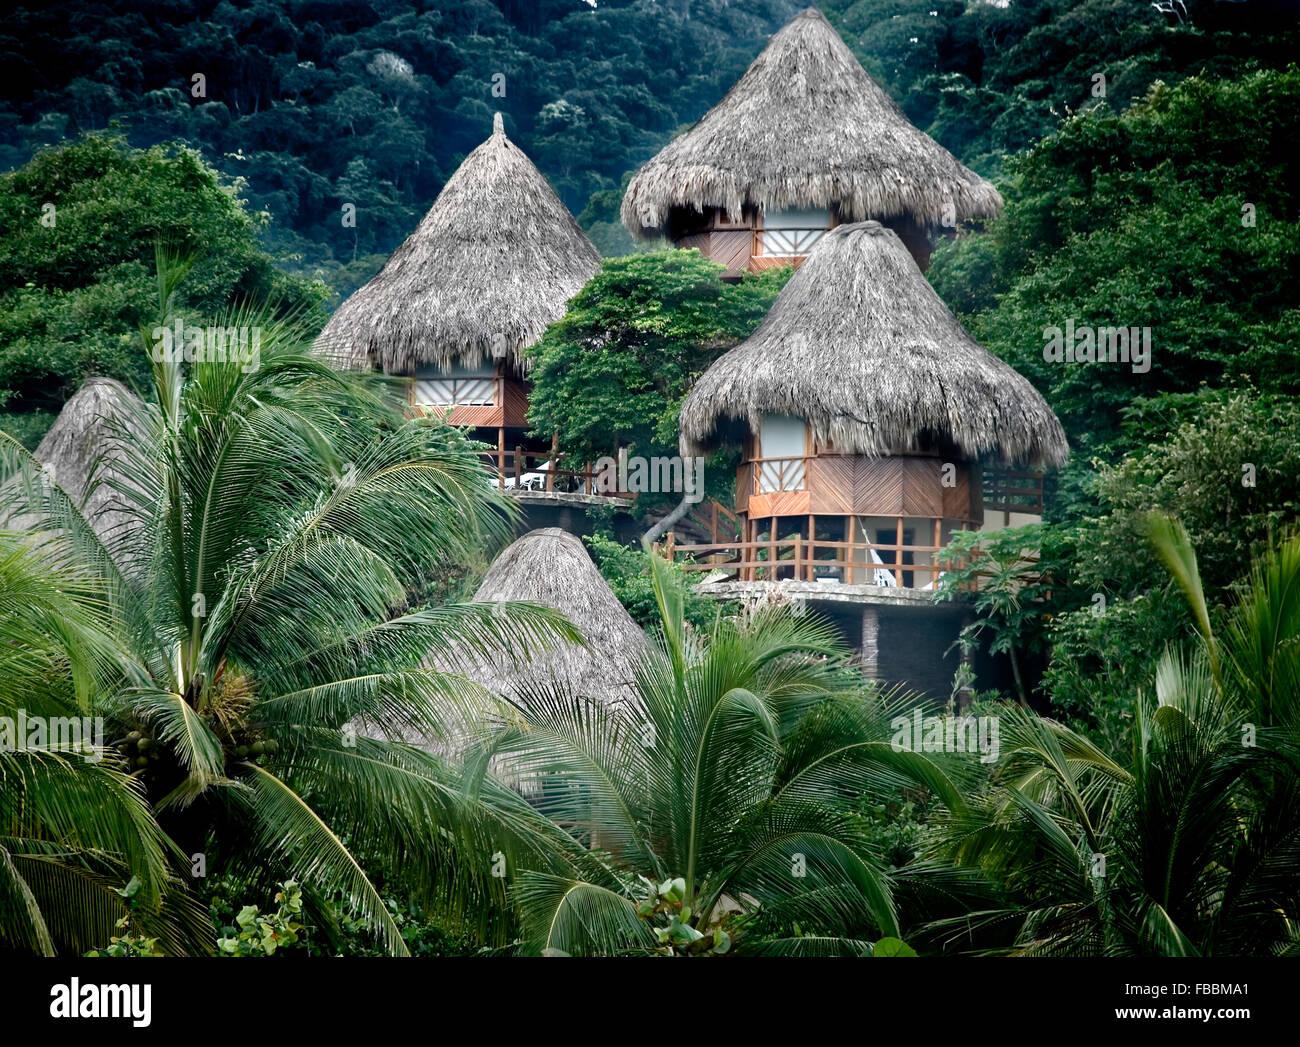 Tayrona National Park, Colombia - Stock Image